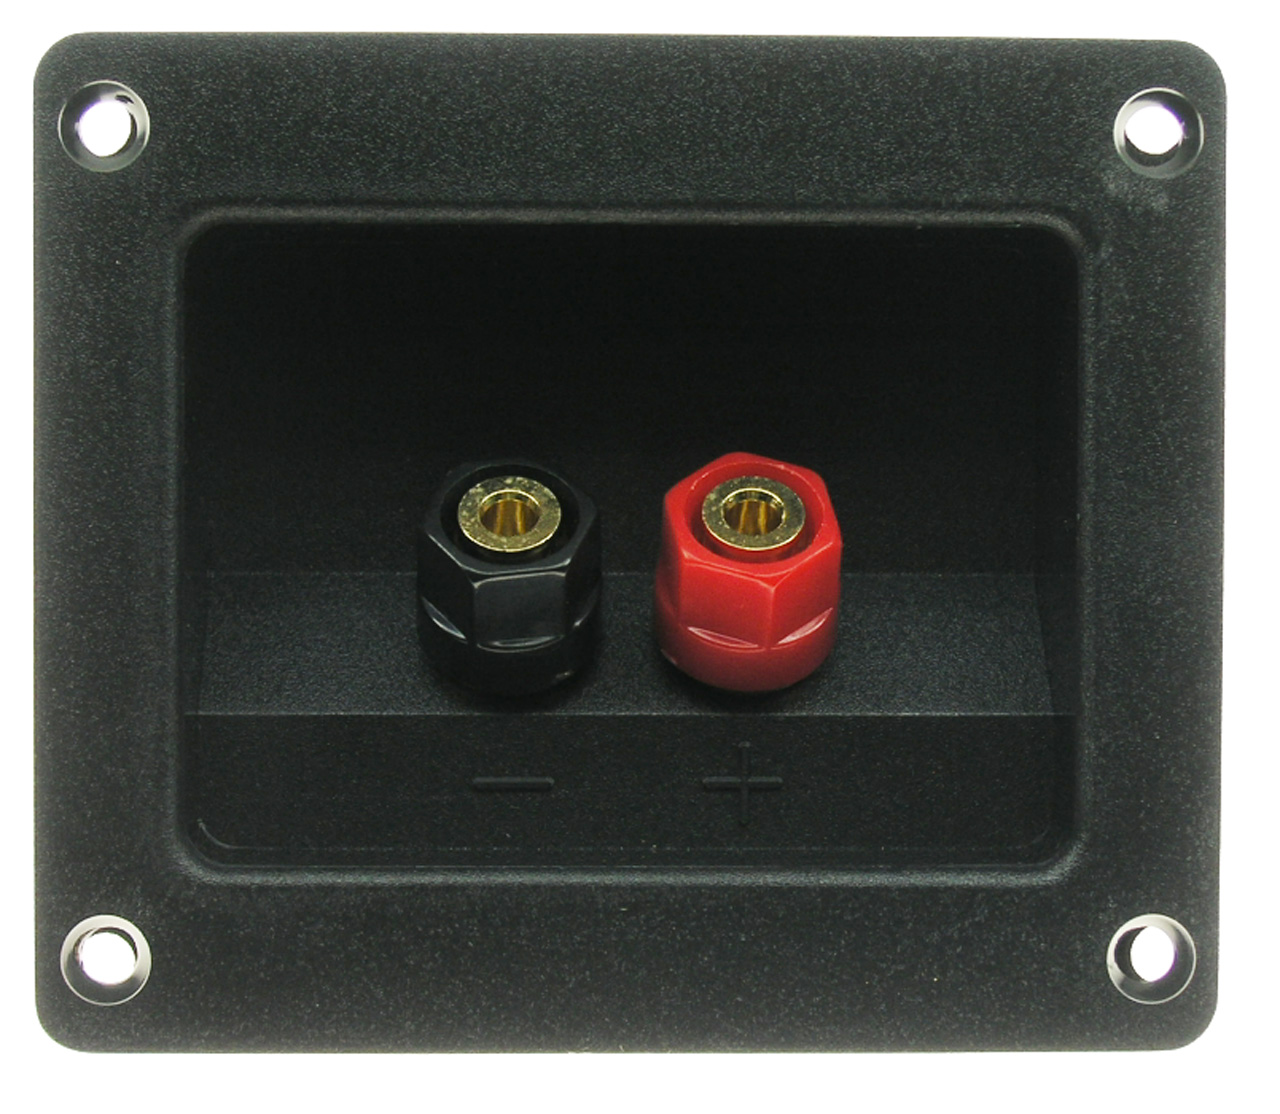 Speaker Terminal Connector, 5 Way Binding Posts, RGT-3025